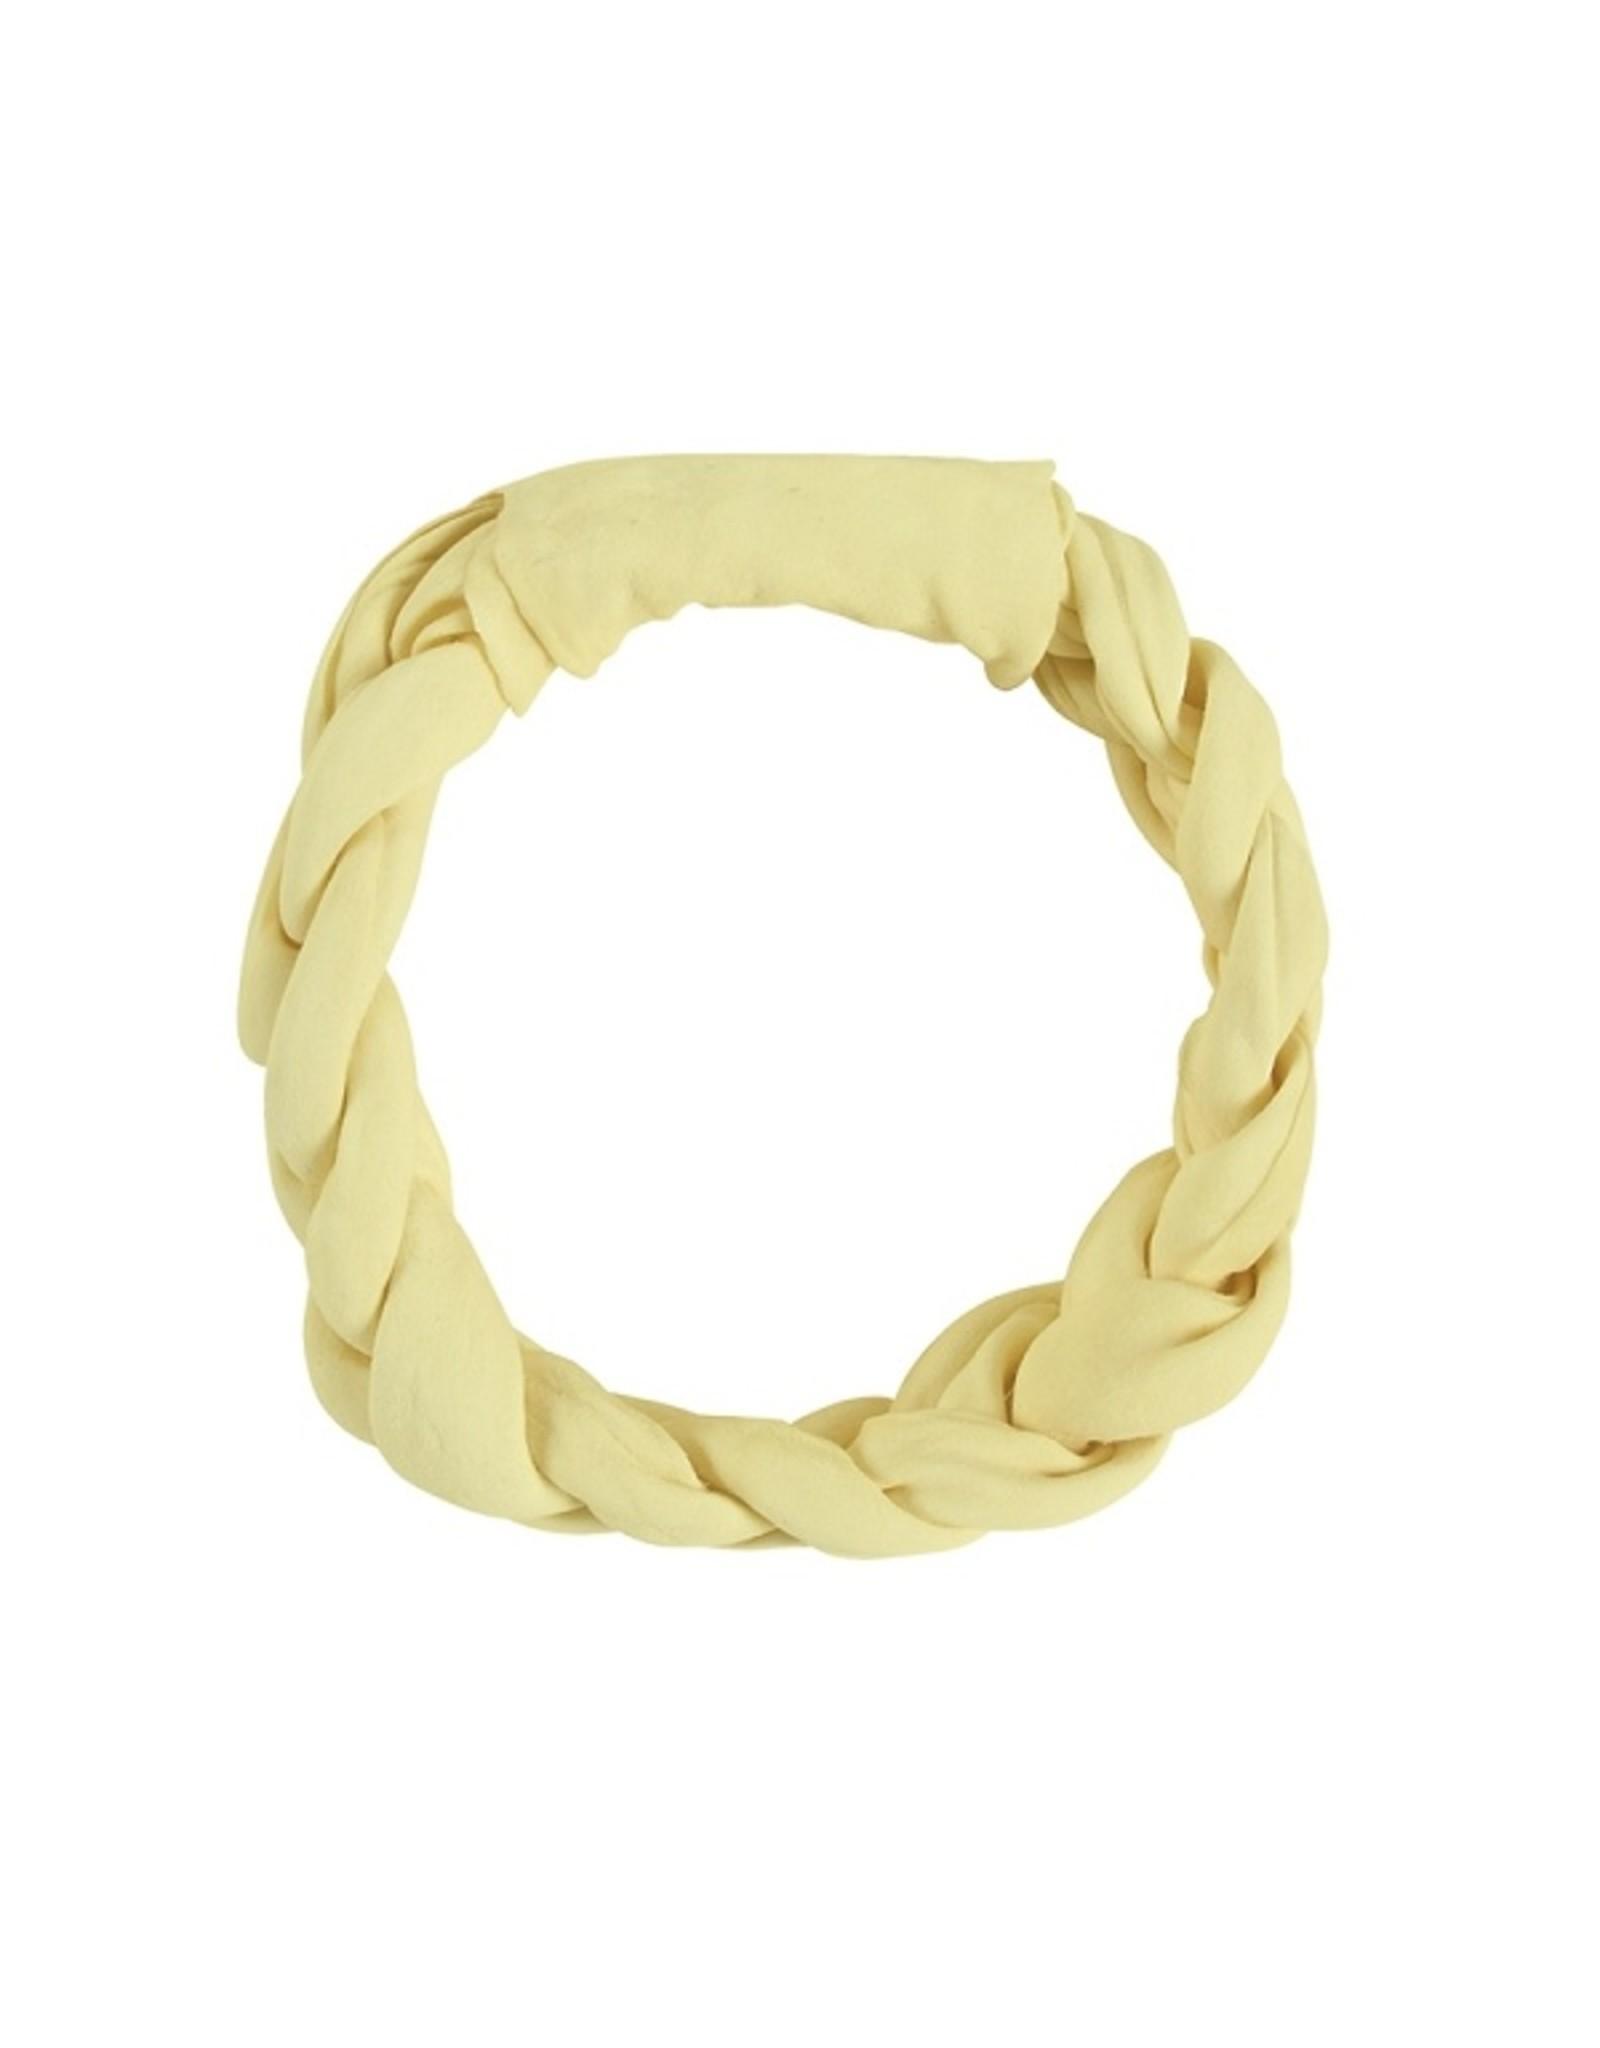 Braided Vanilla Rawhide Ring 5in